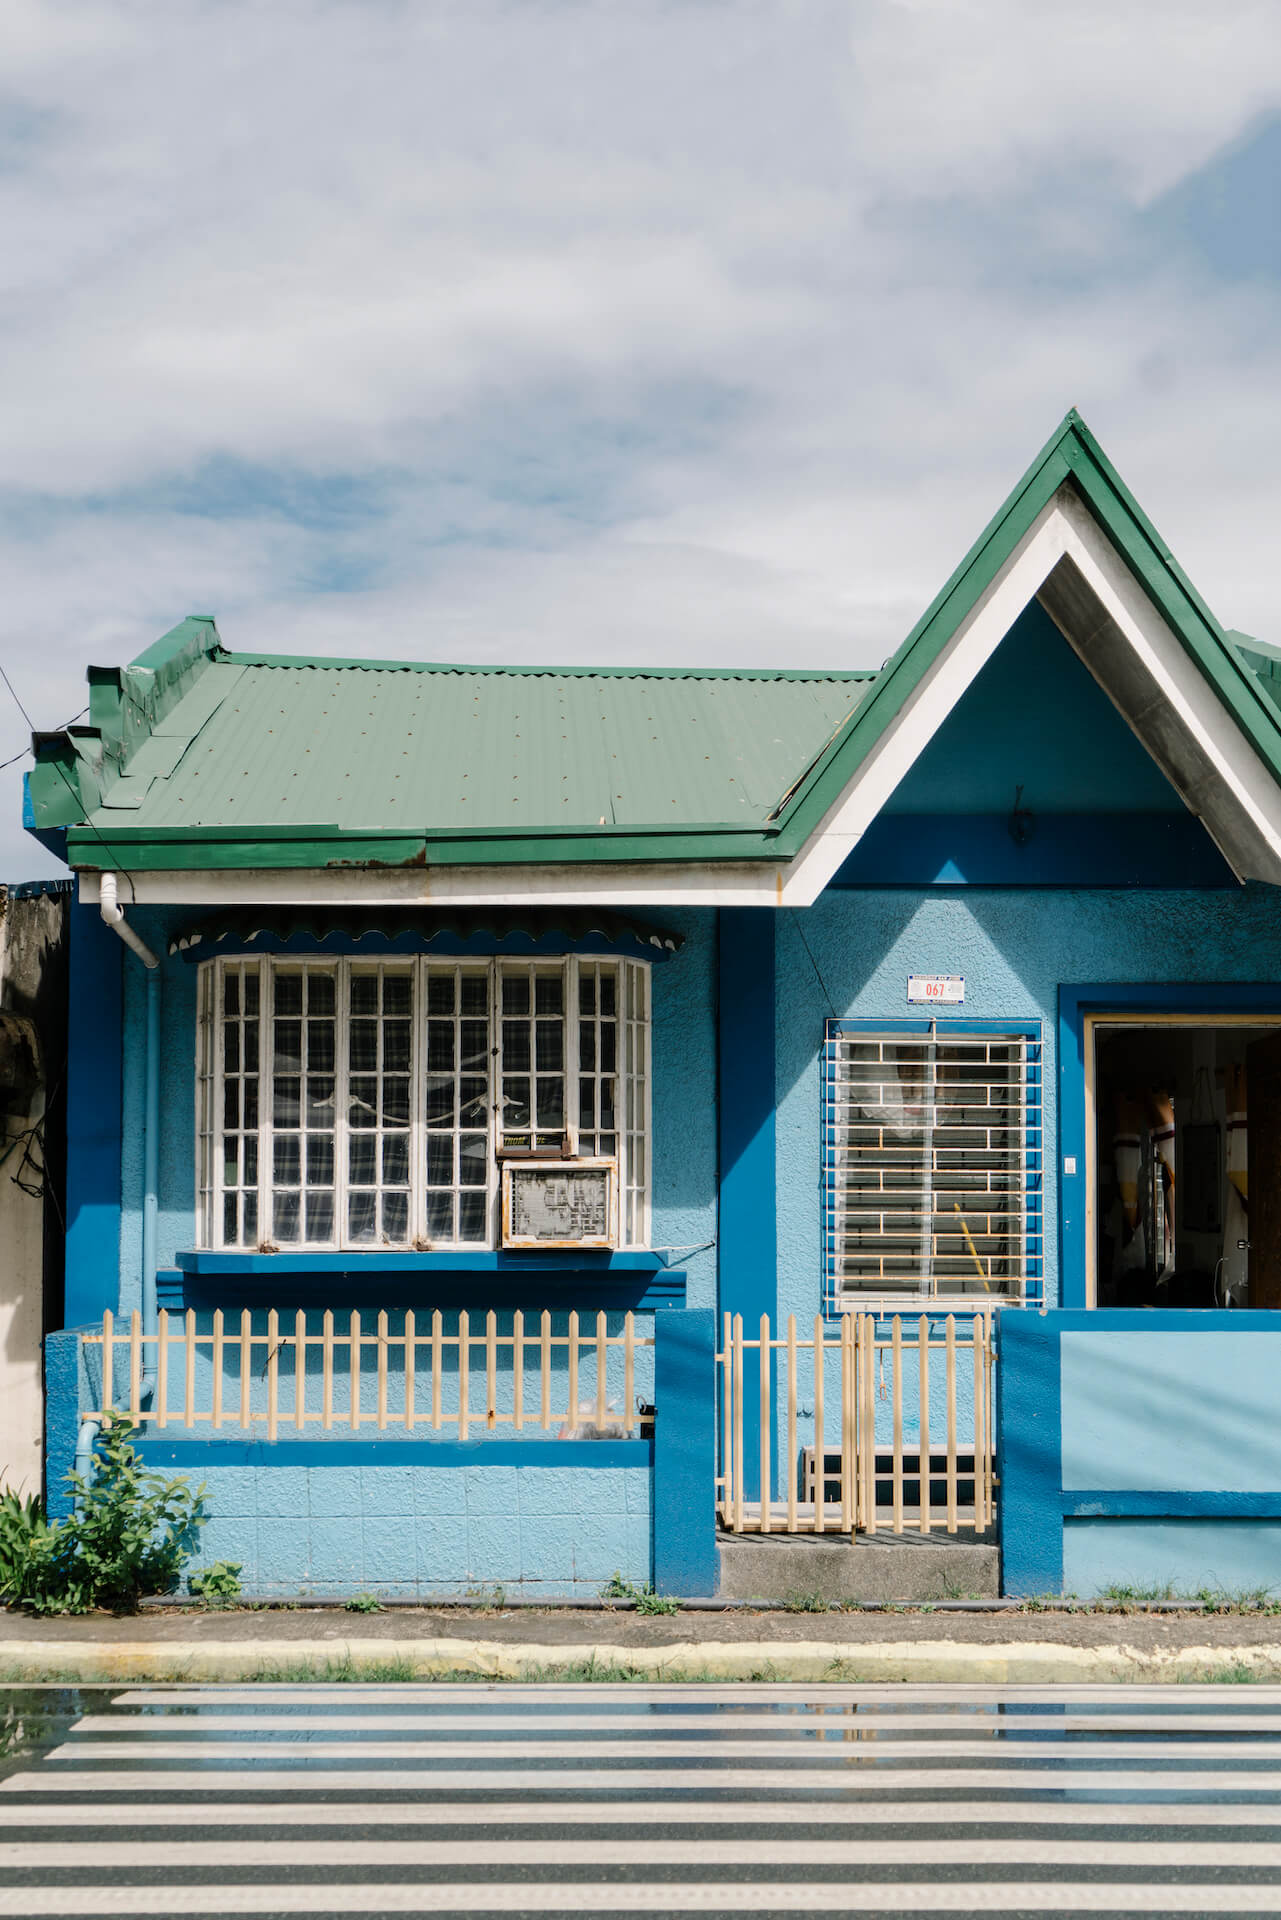 Exterior of the ManuMano freedive house